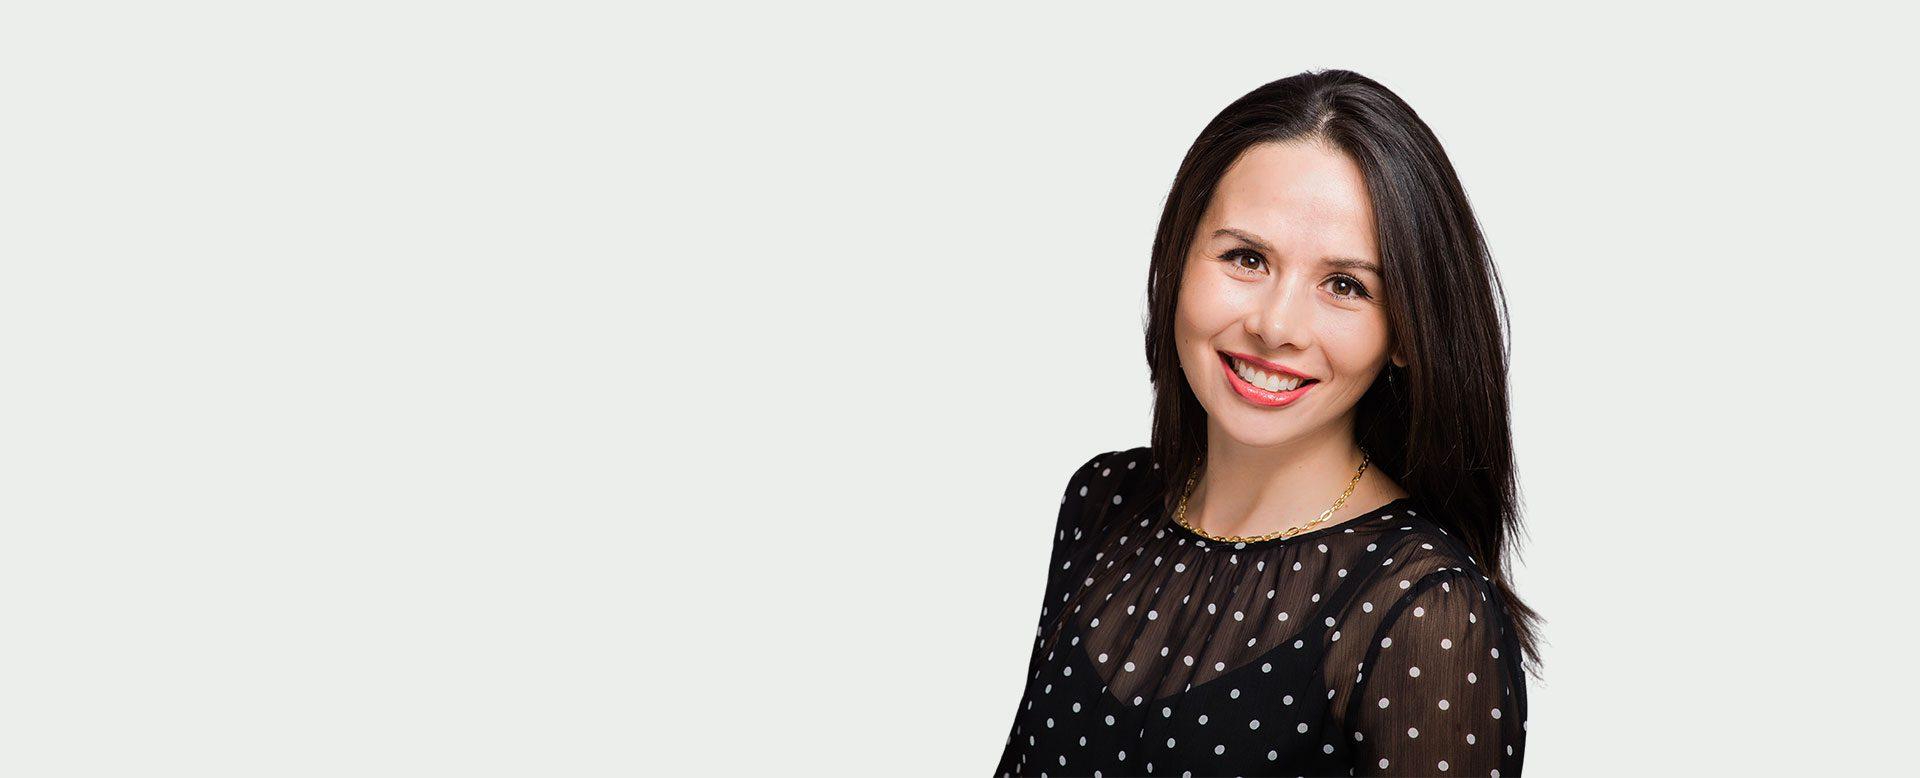 Woman smiling with beautiful teeth